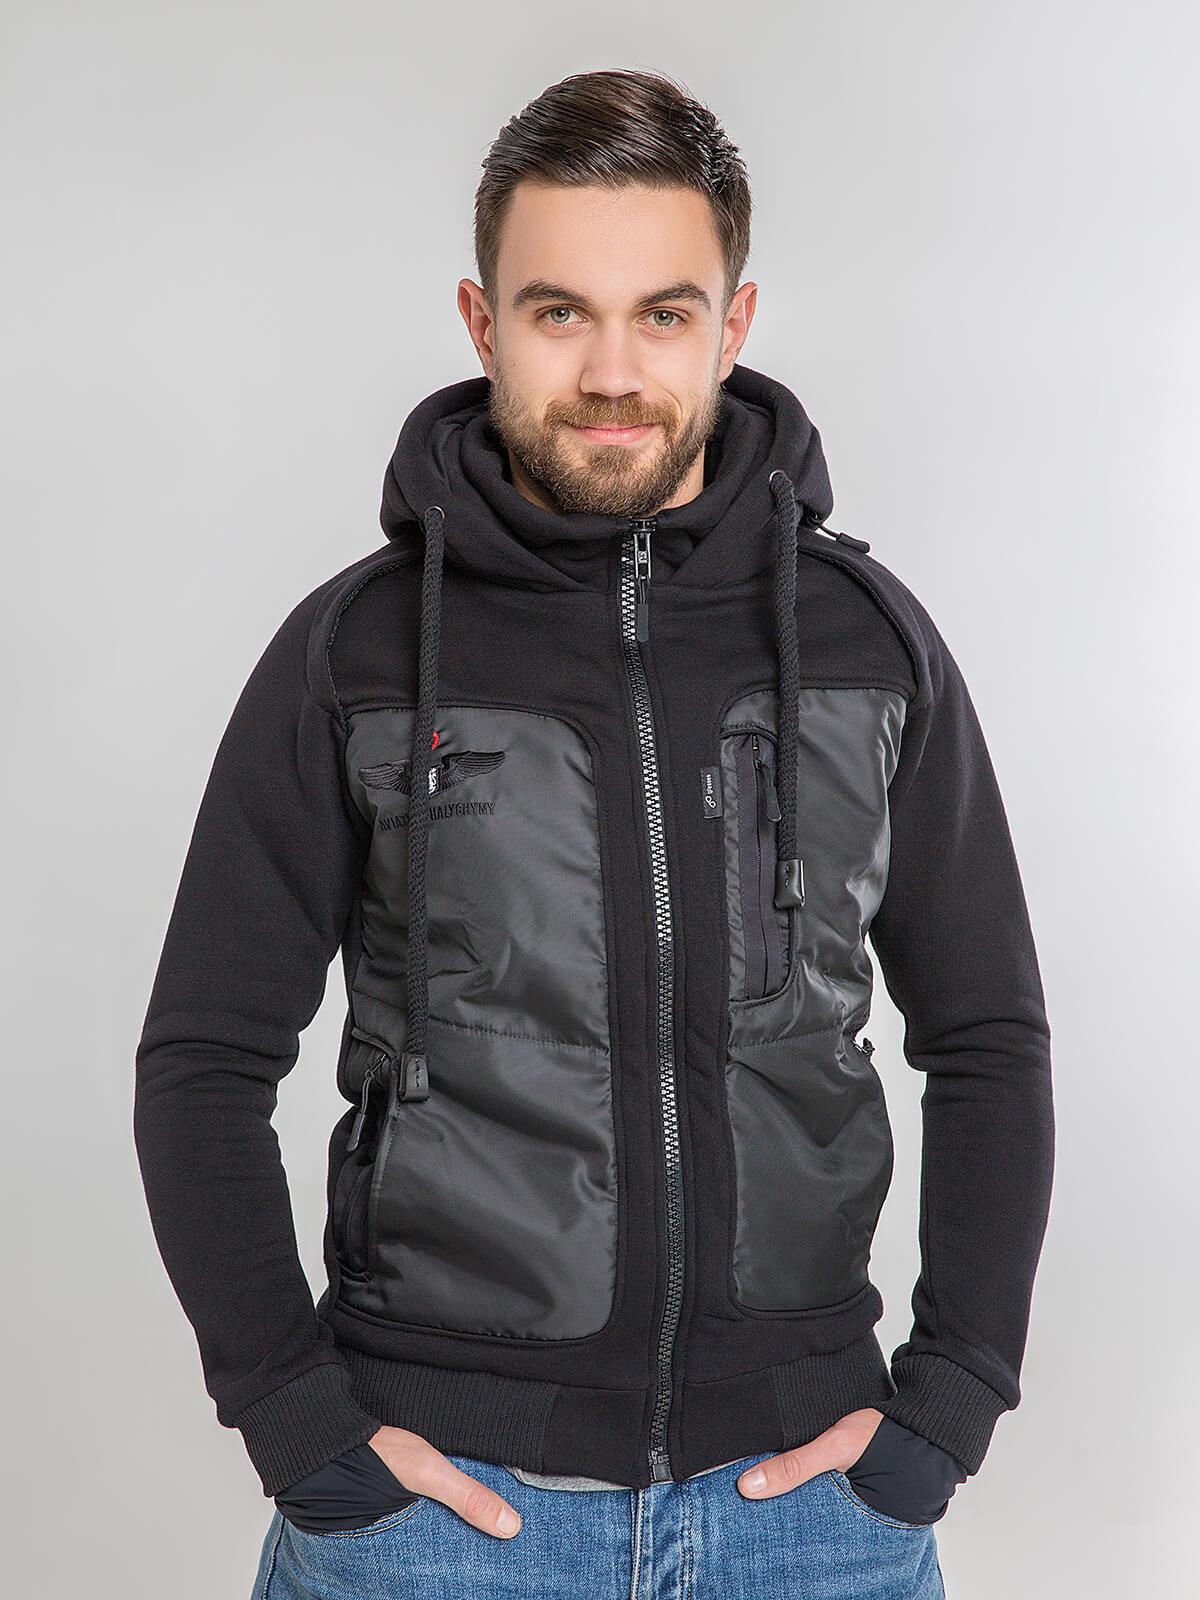 Men's Hoodie Syla. Color black. Unisex hoodie (men's sizes).